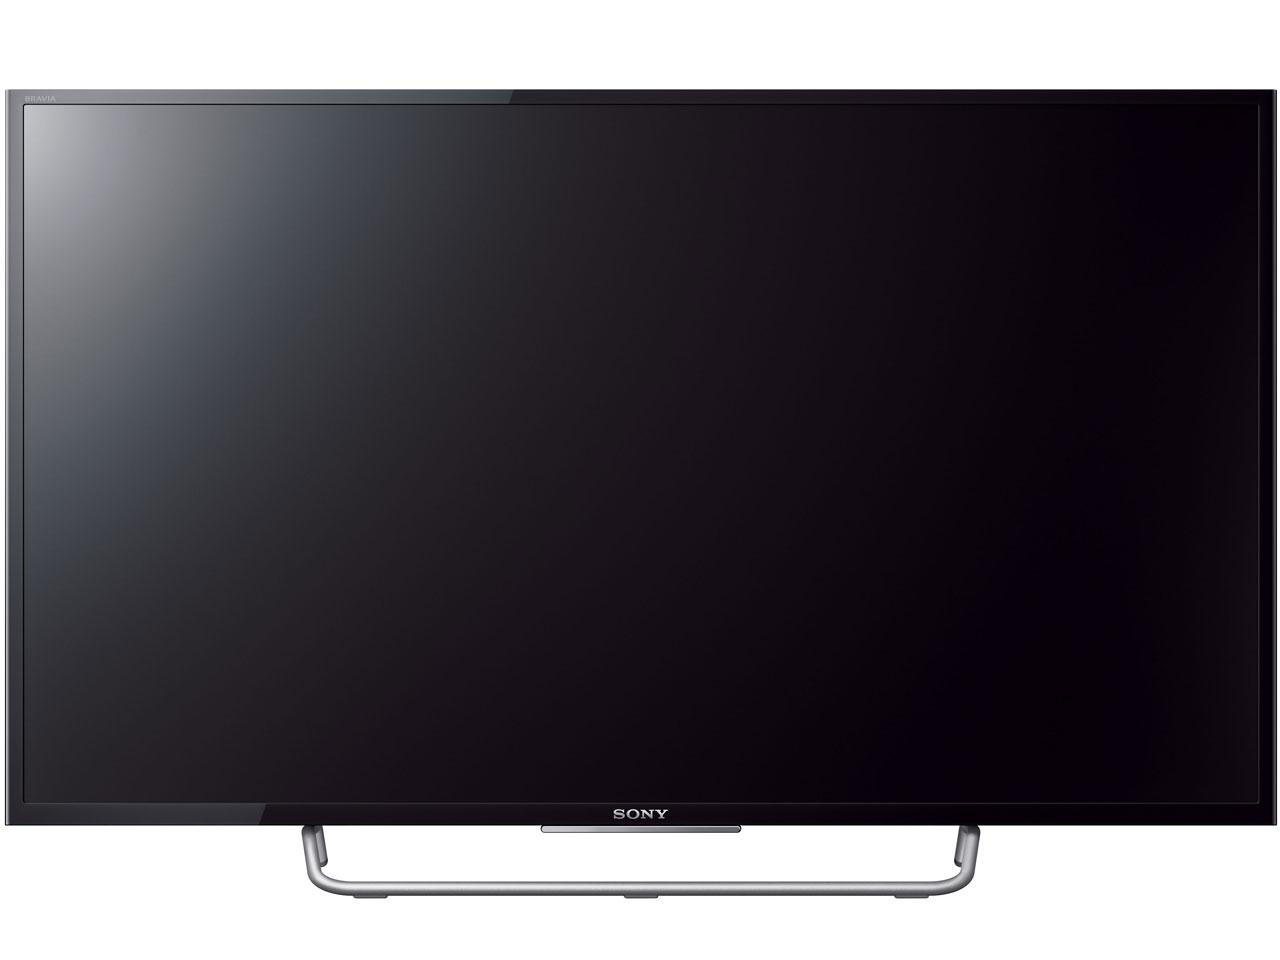 BRAVIA KJ-40W700C [40インチ] の製品画像